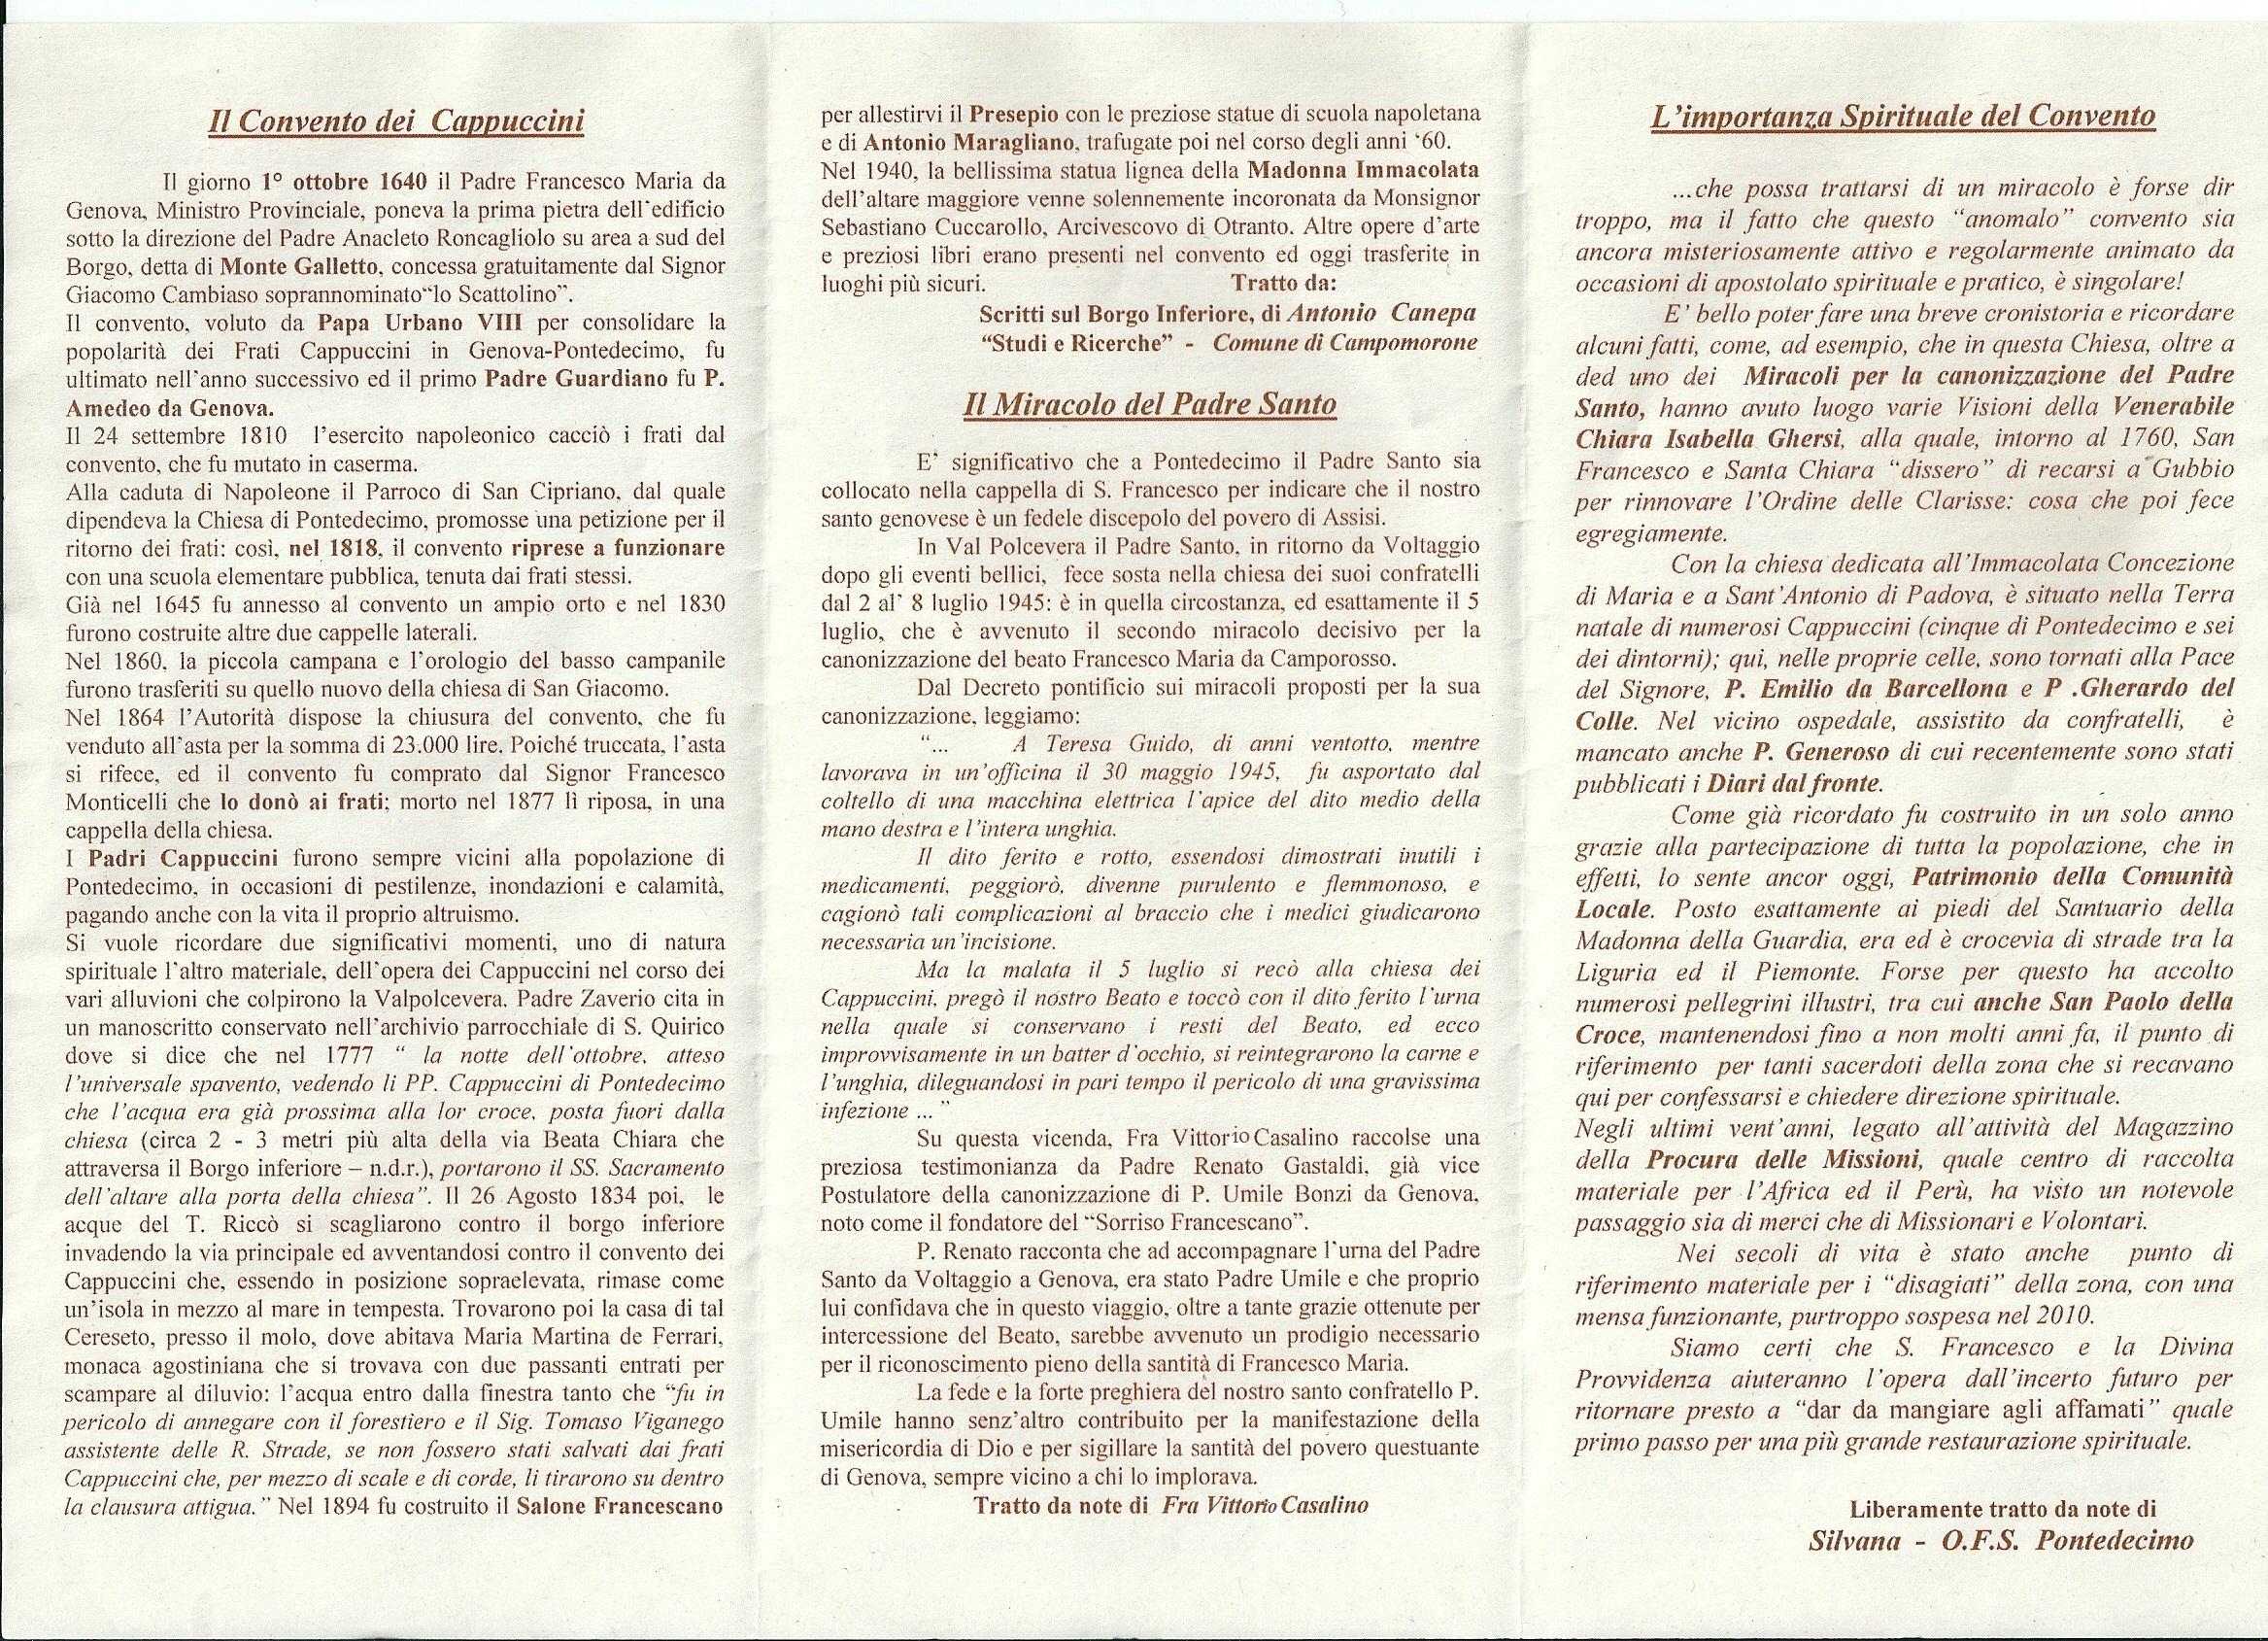 Cenni storici su convento Pontedecimo